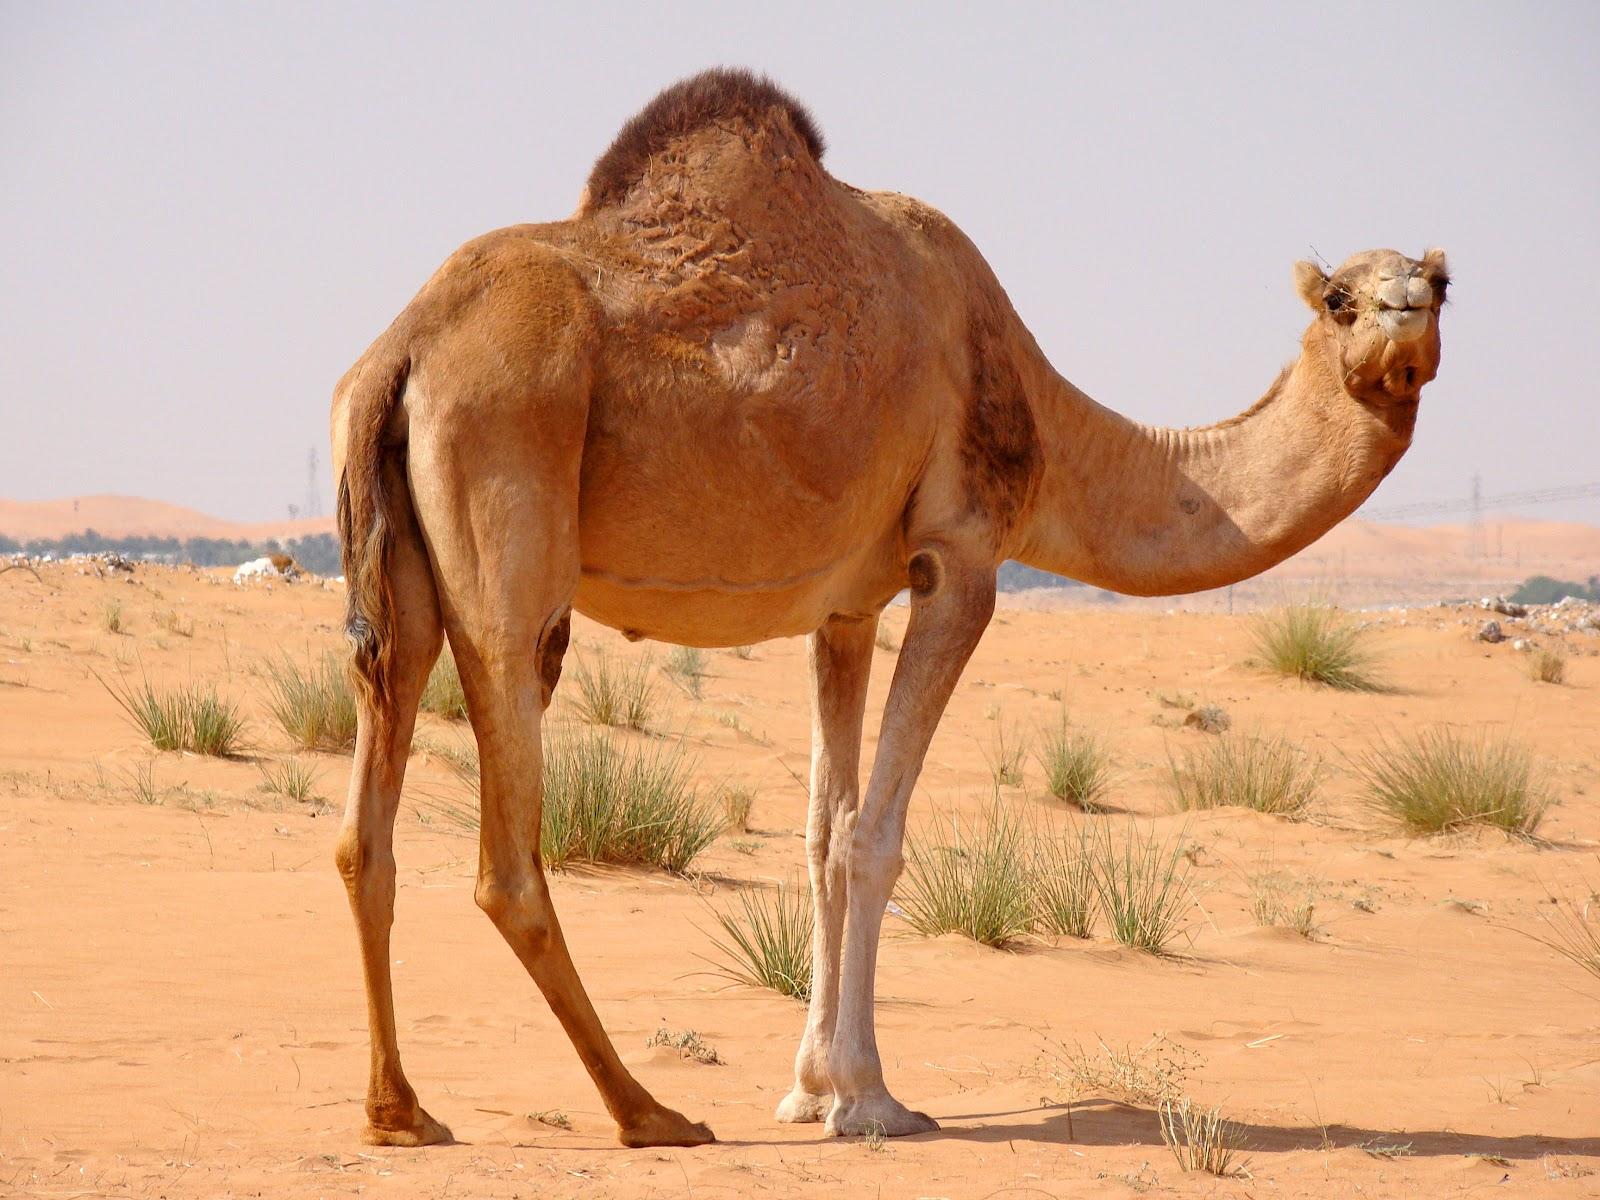 Нигерия: Верблюжье мясо для праздника!